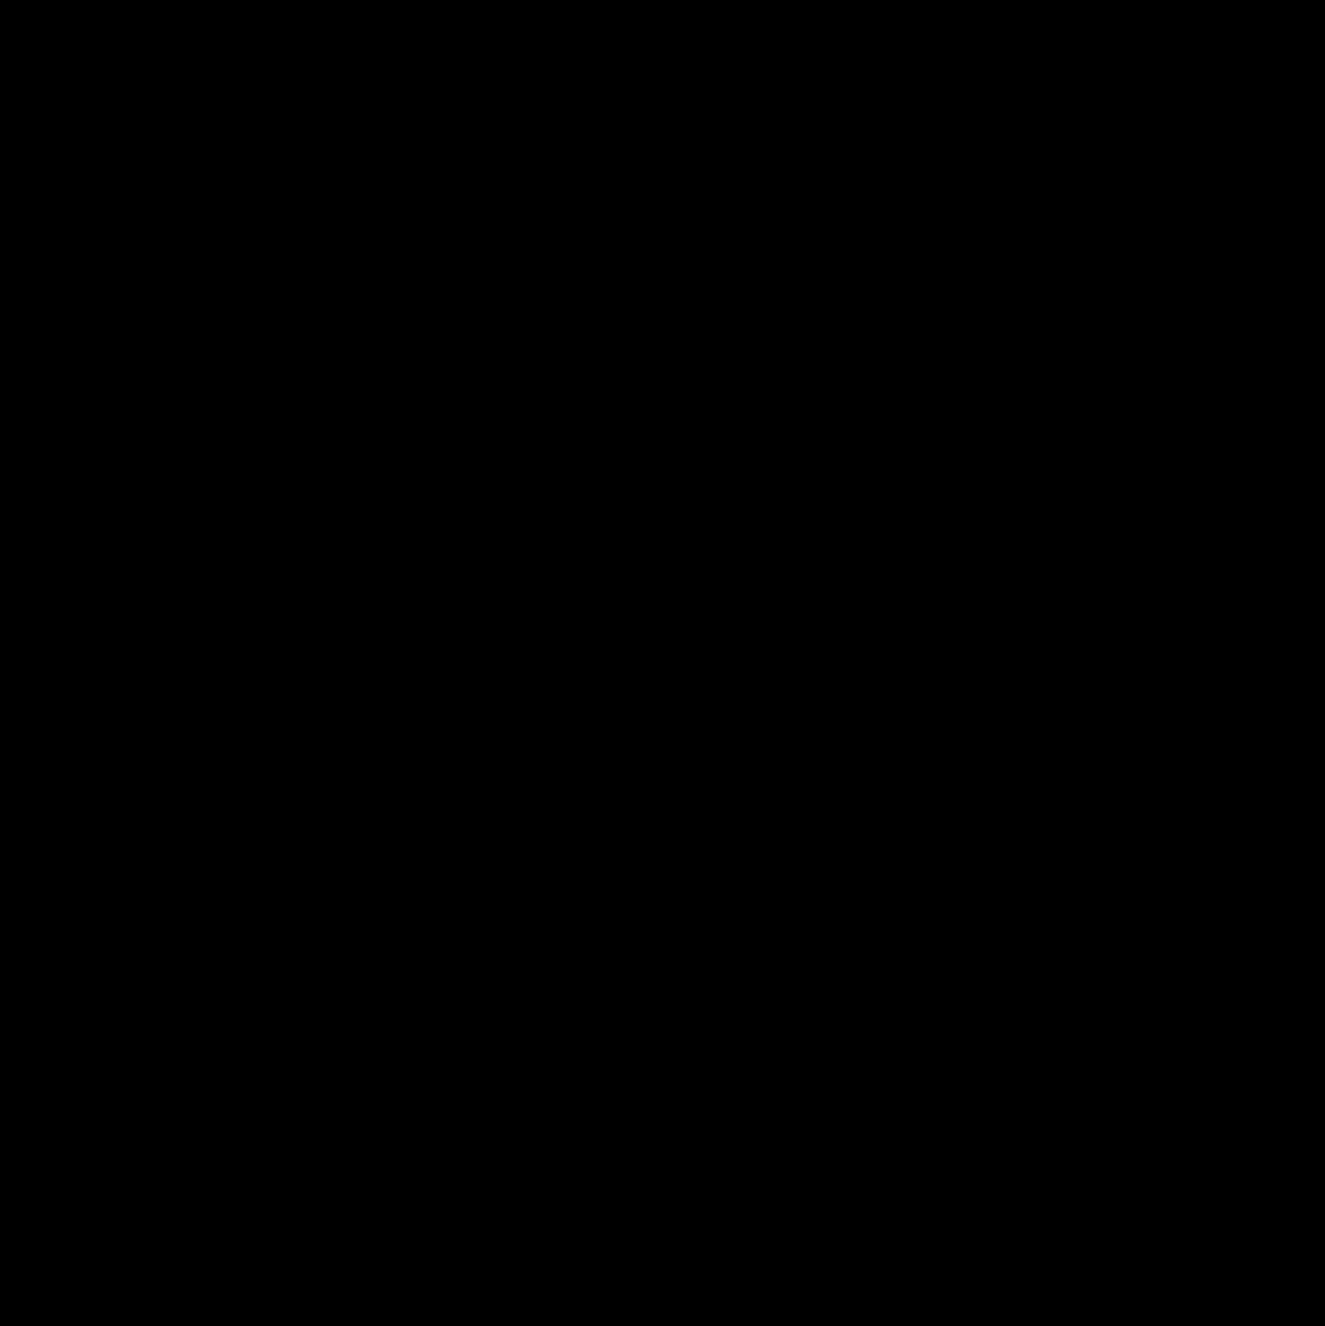 #3KV 01-04-15